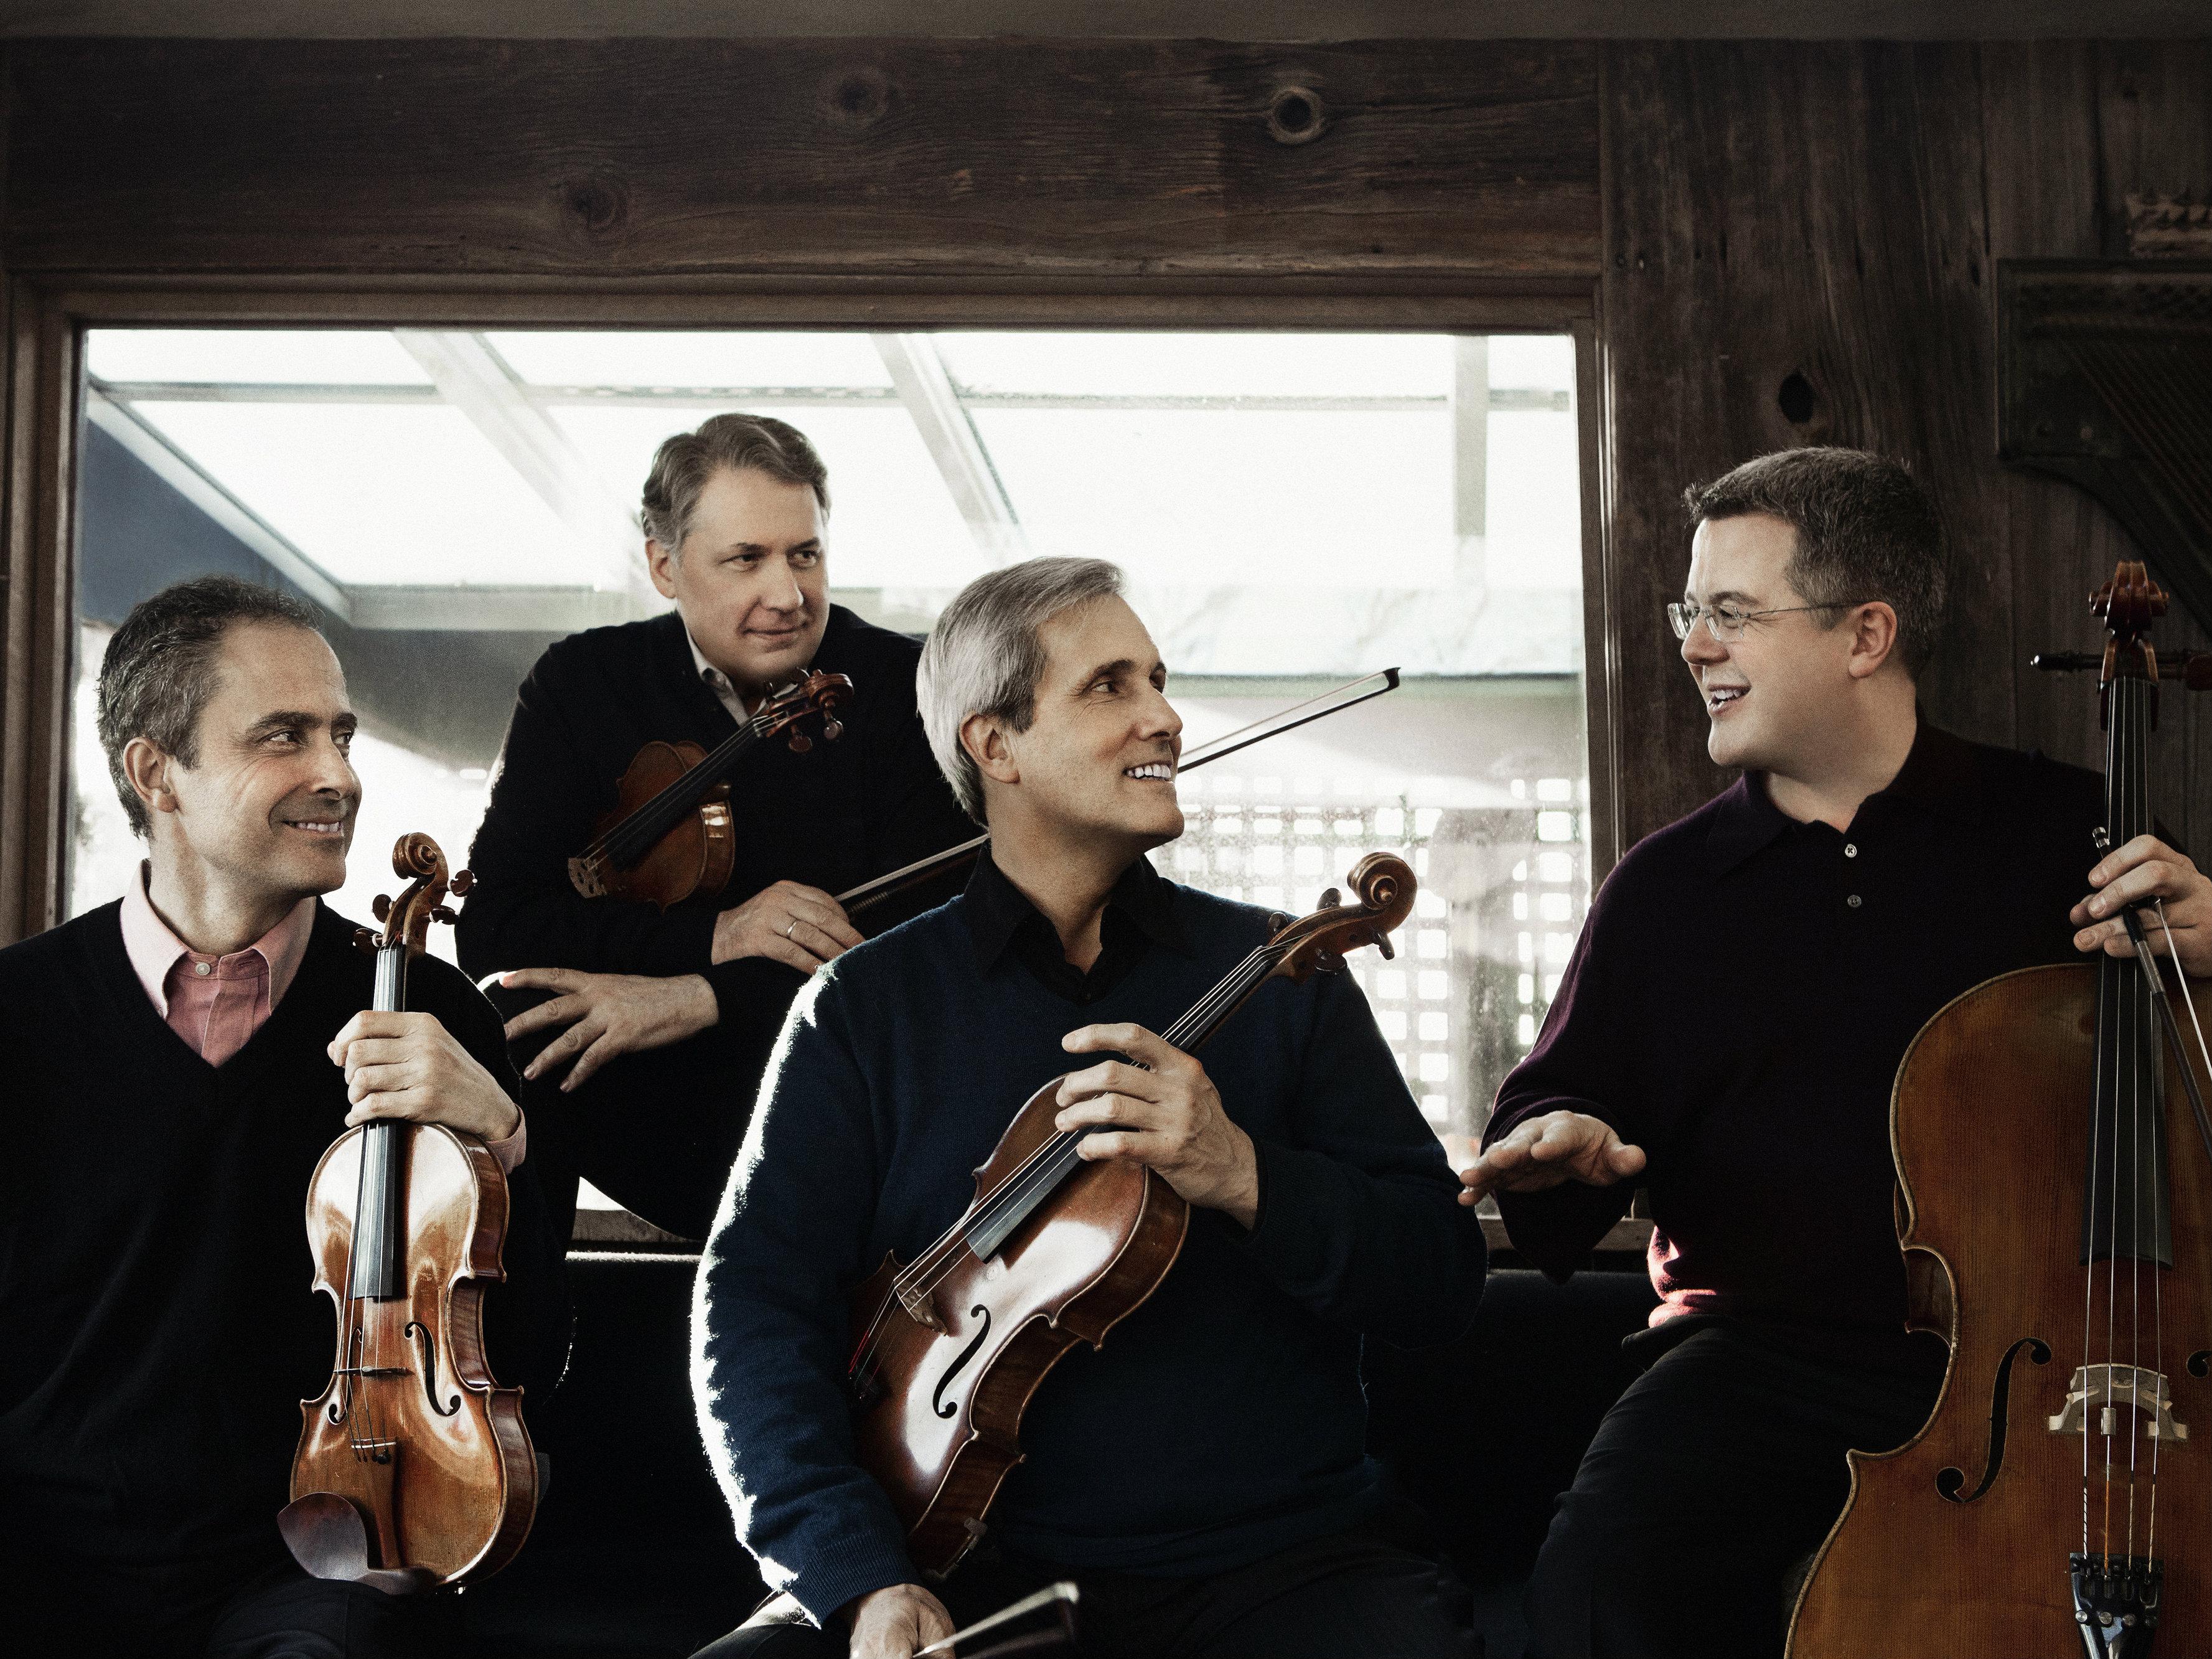 Photo: Emerson String Quartet